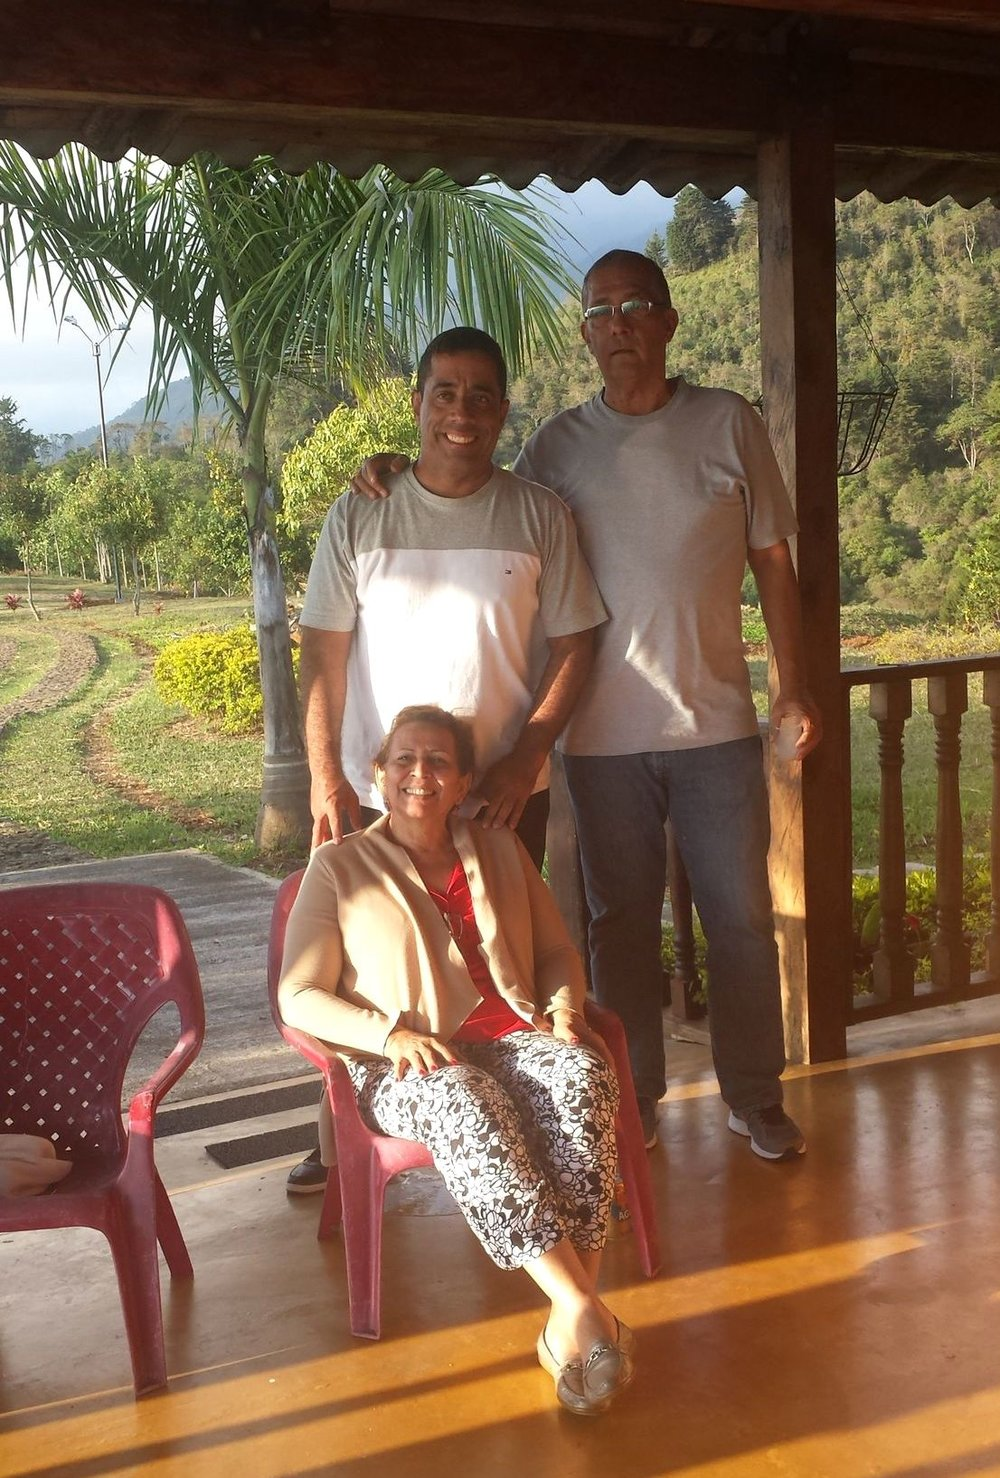 Edgar (à gauche) avec ses amis, Finca de Barlovento, Valle del Cauca, Colombie